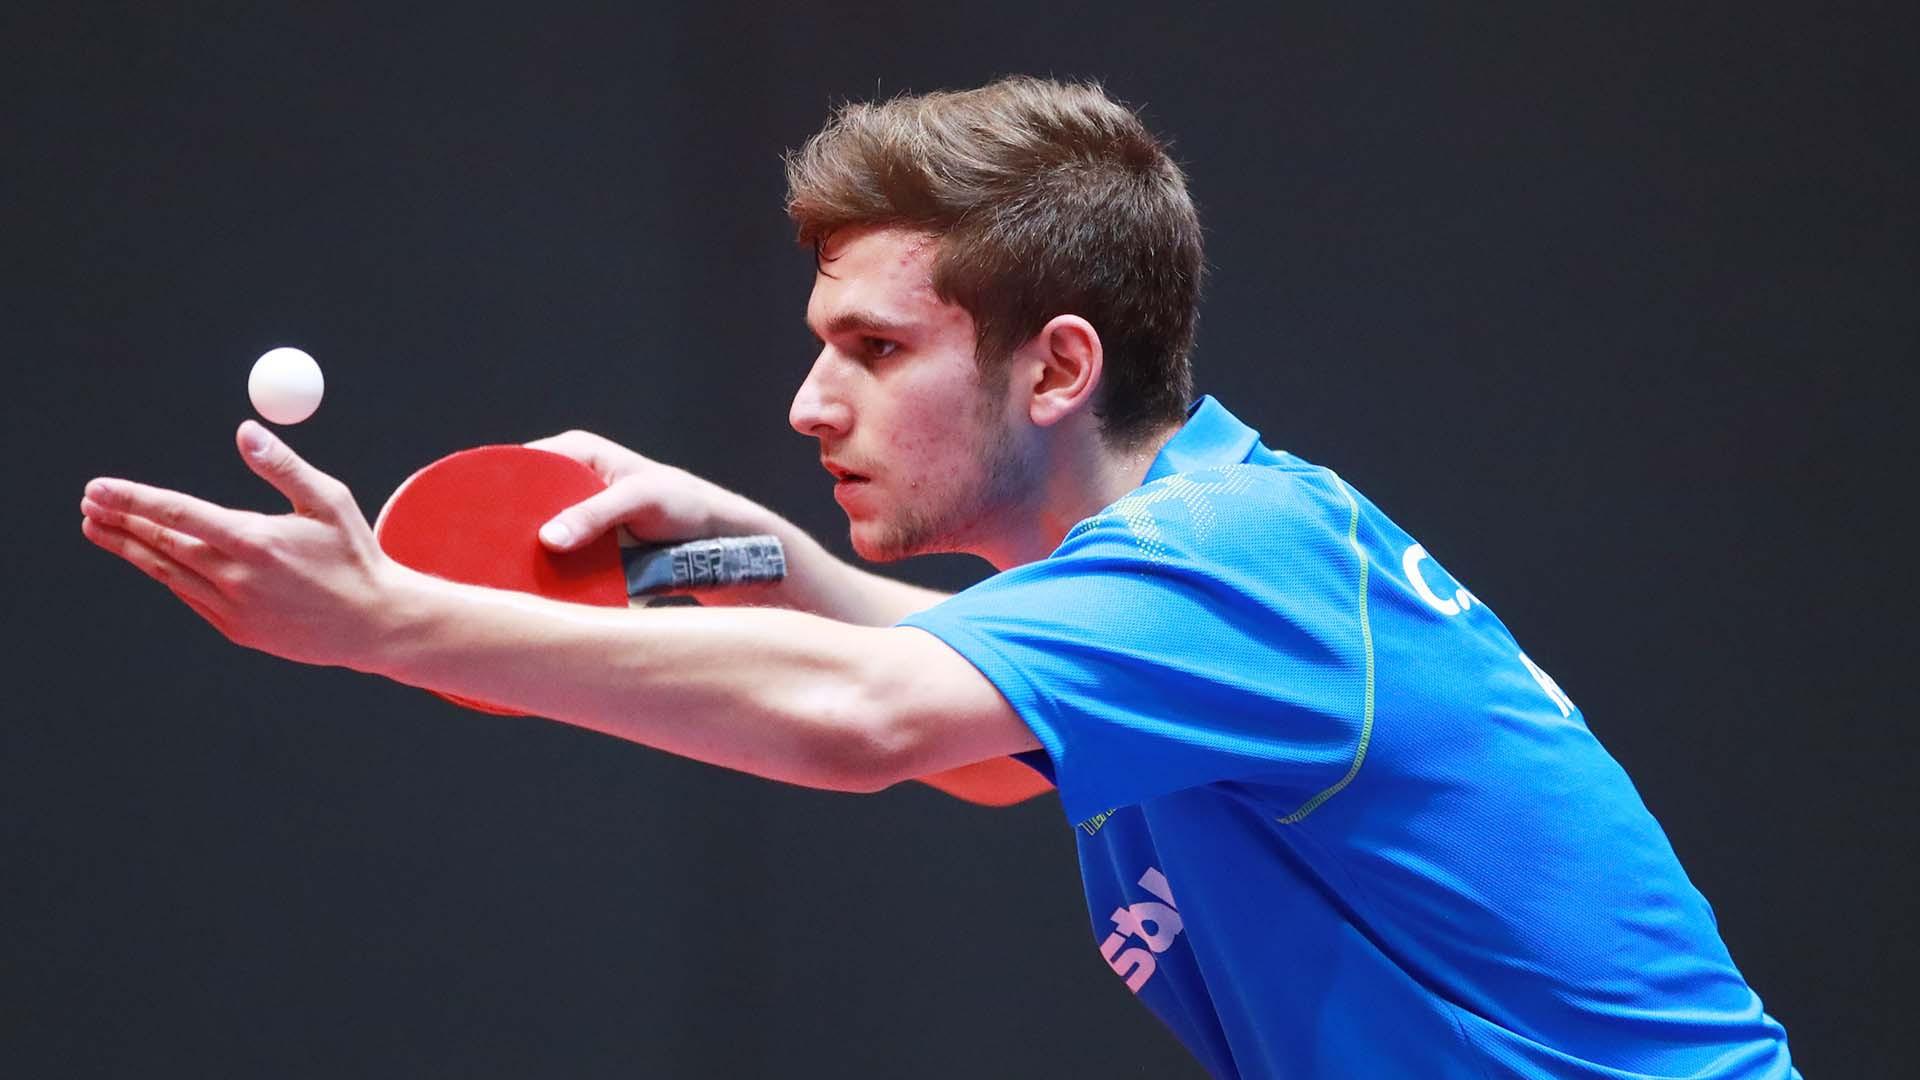 Romania's Cristian Pletea will play China's Xu Haidong in the semi-finals of the ITTF World Junior Championships ©ITTF